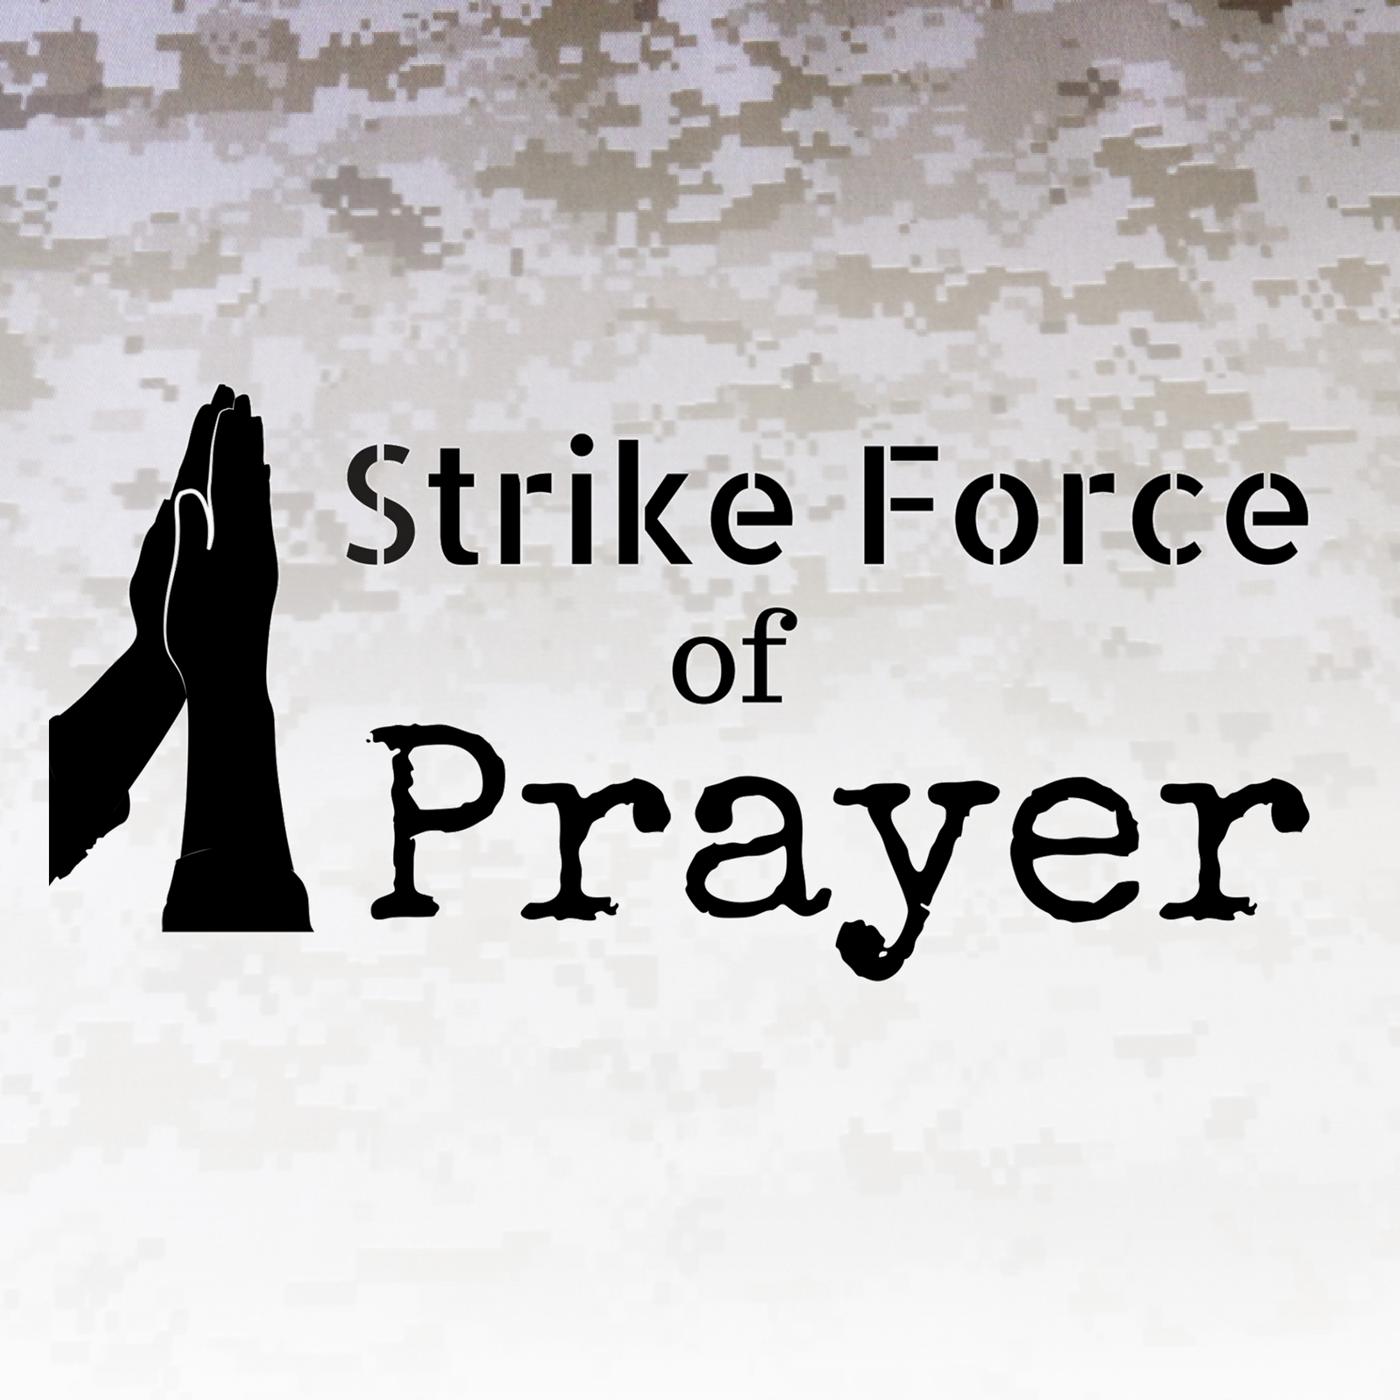 Strike Force of Prayer